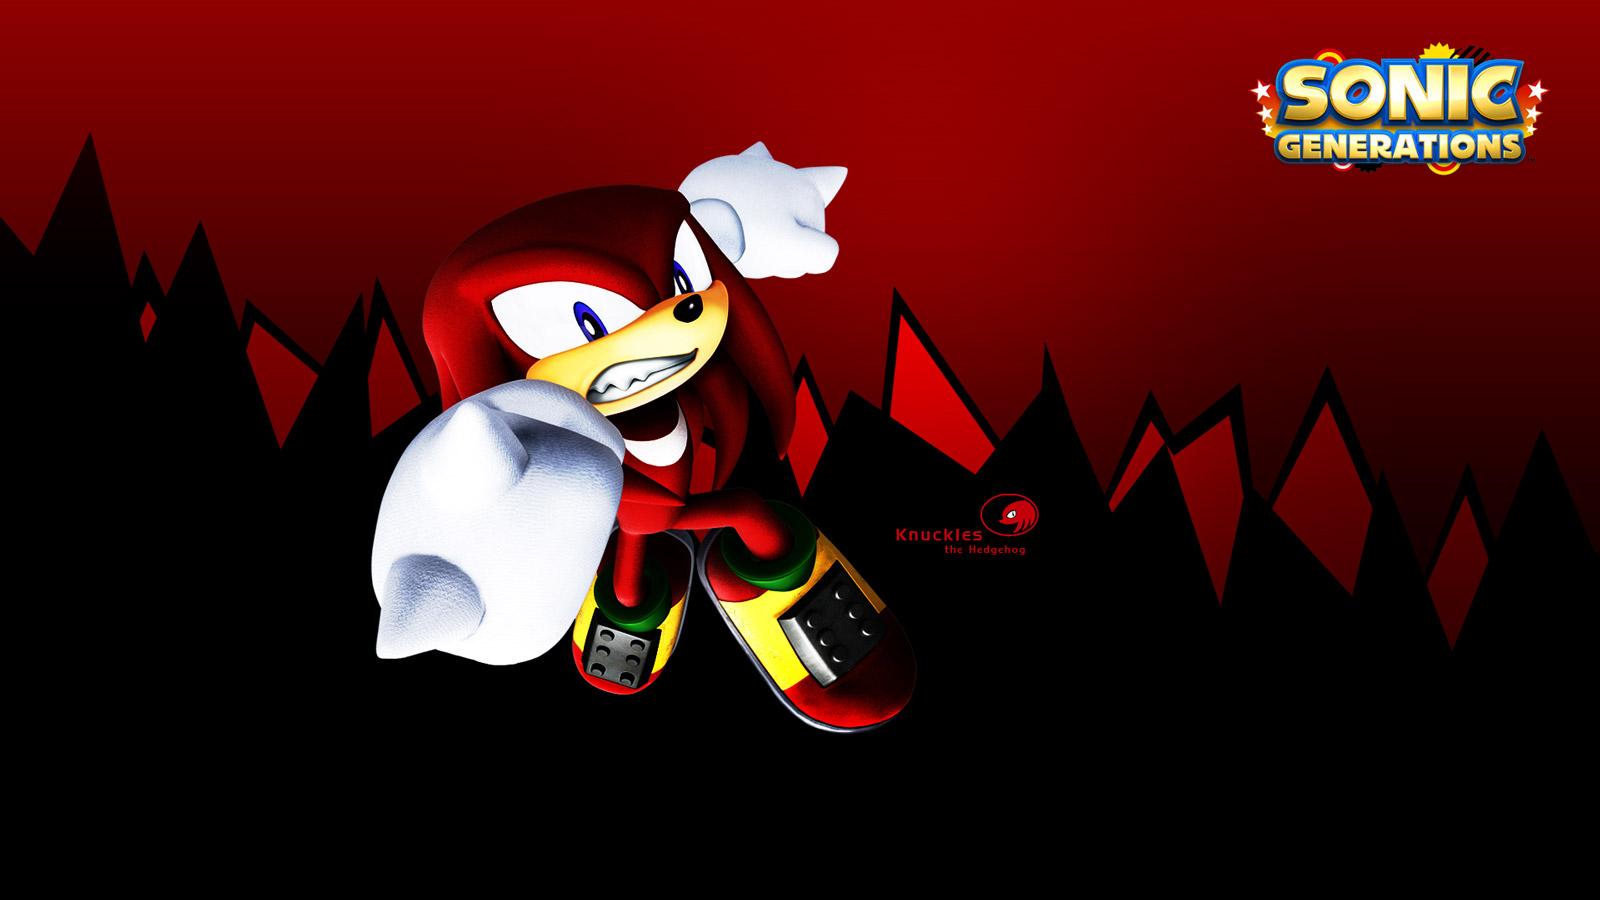 Free Sonic Generations Wallpaper in 1600x900